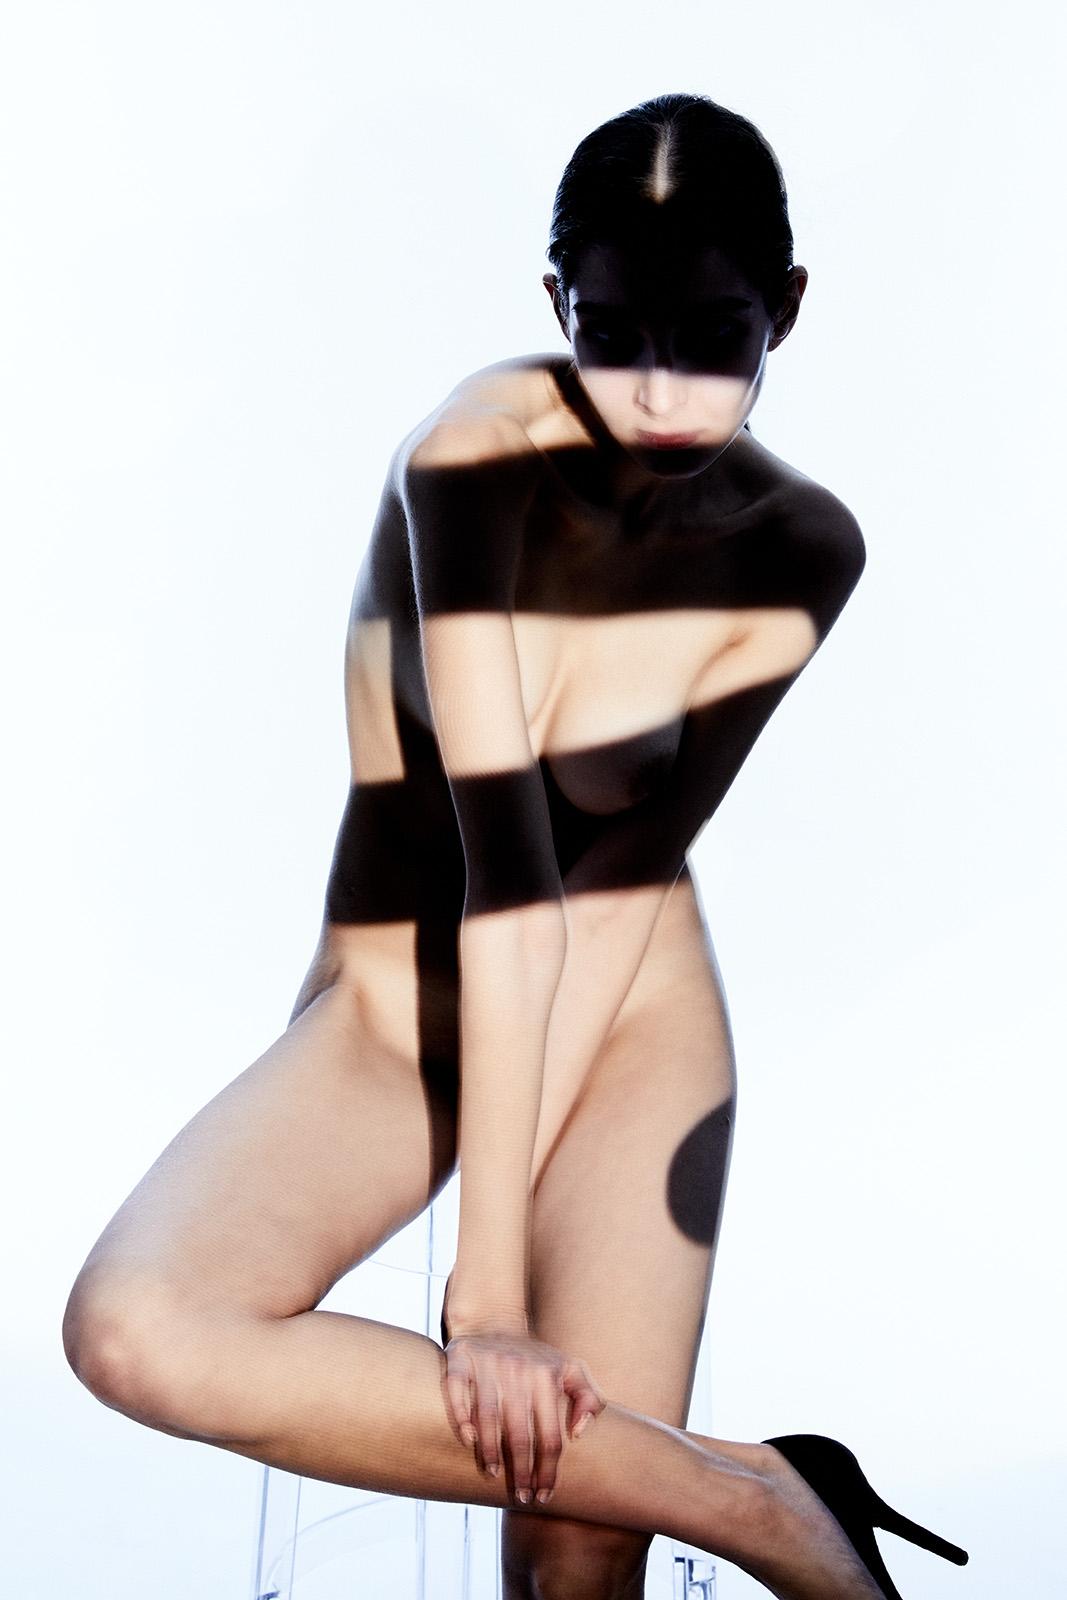 Lina-Lorenza-Nude-Nudo-Star-com-2